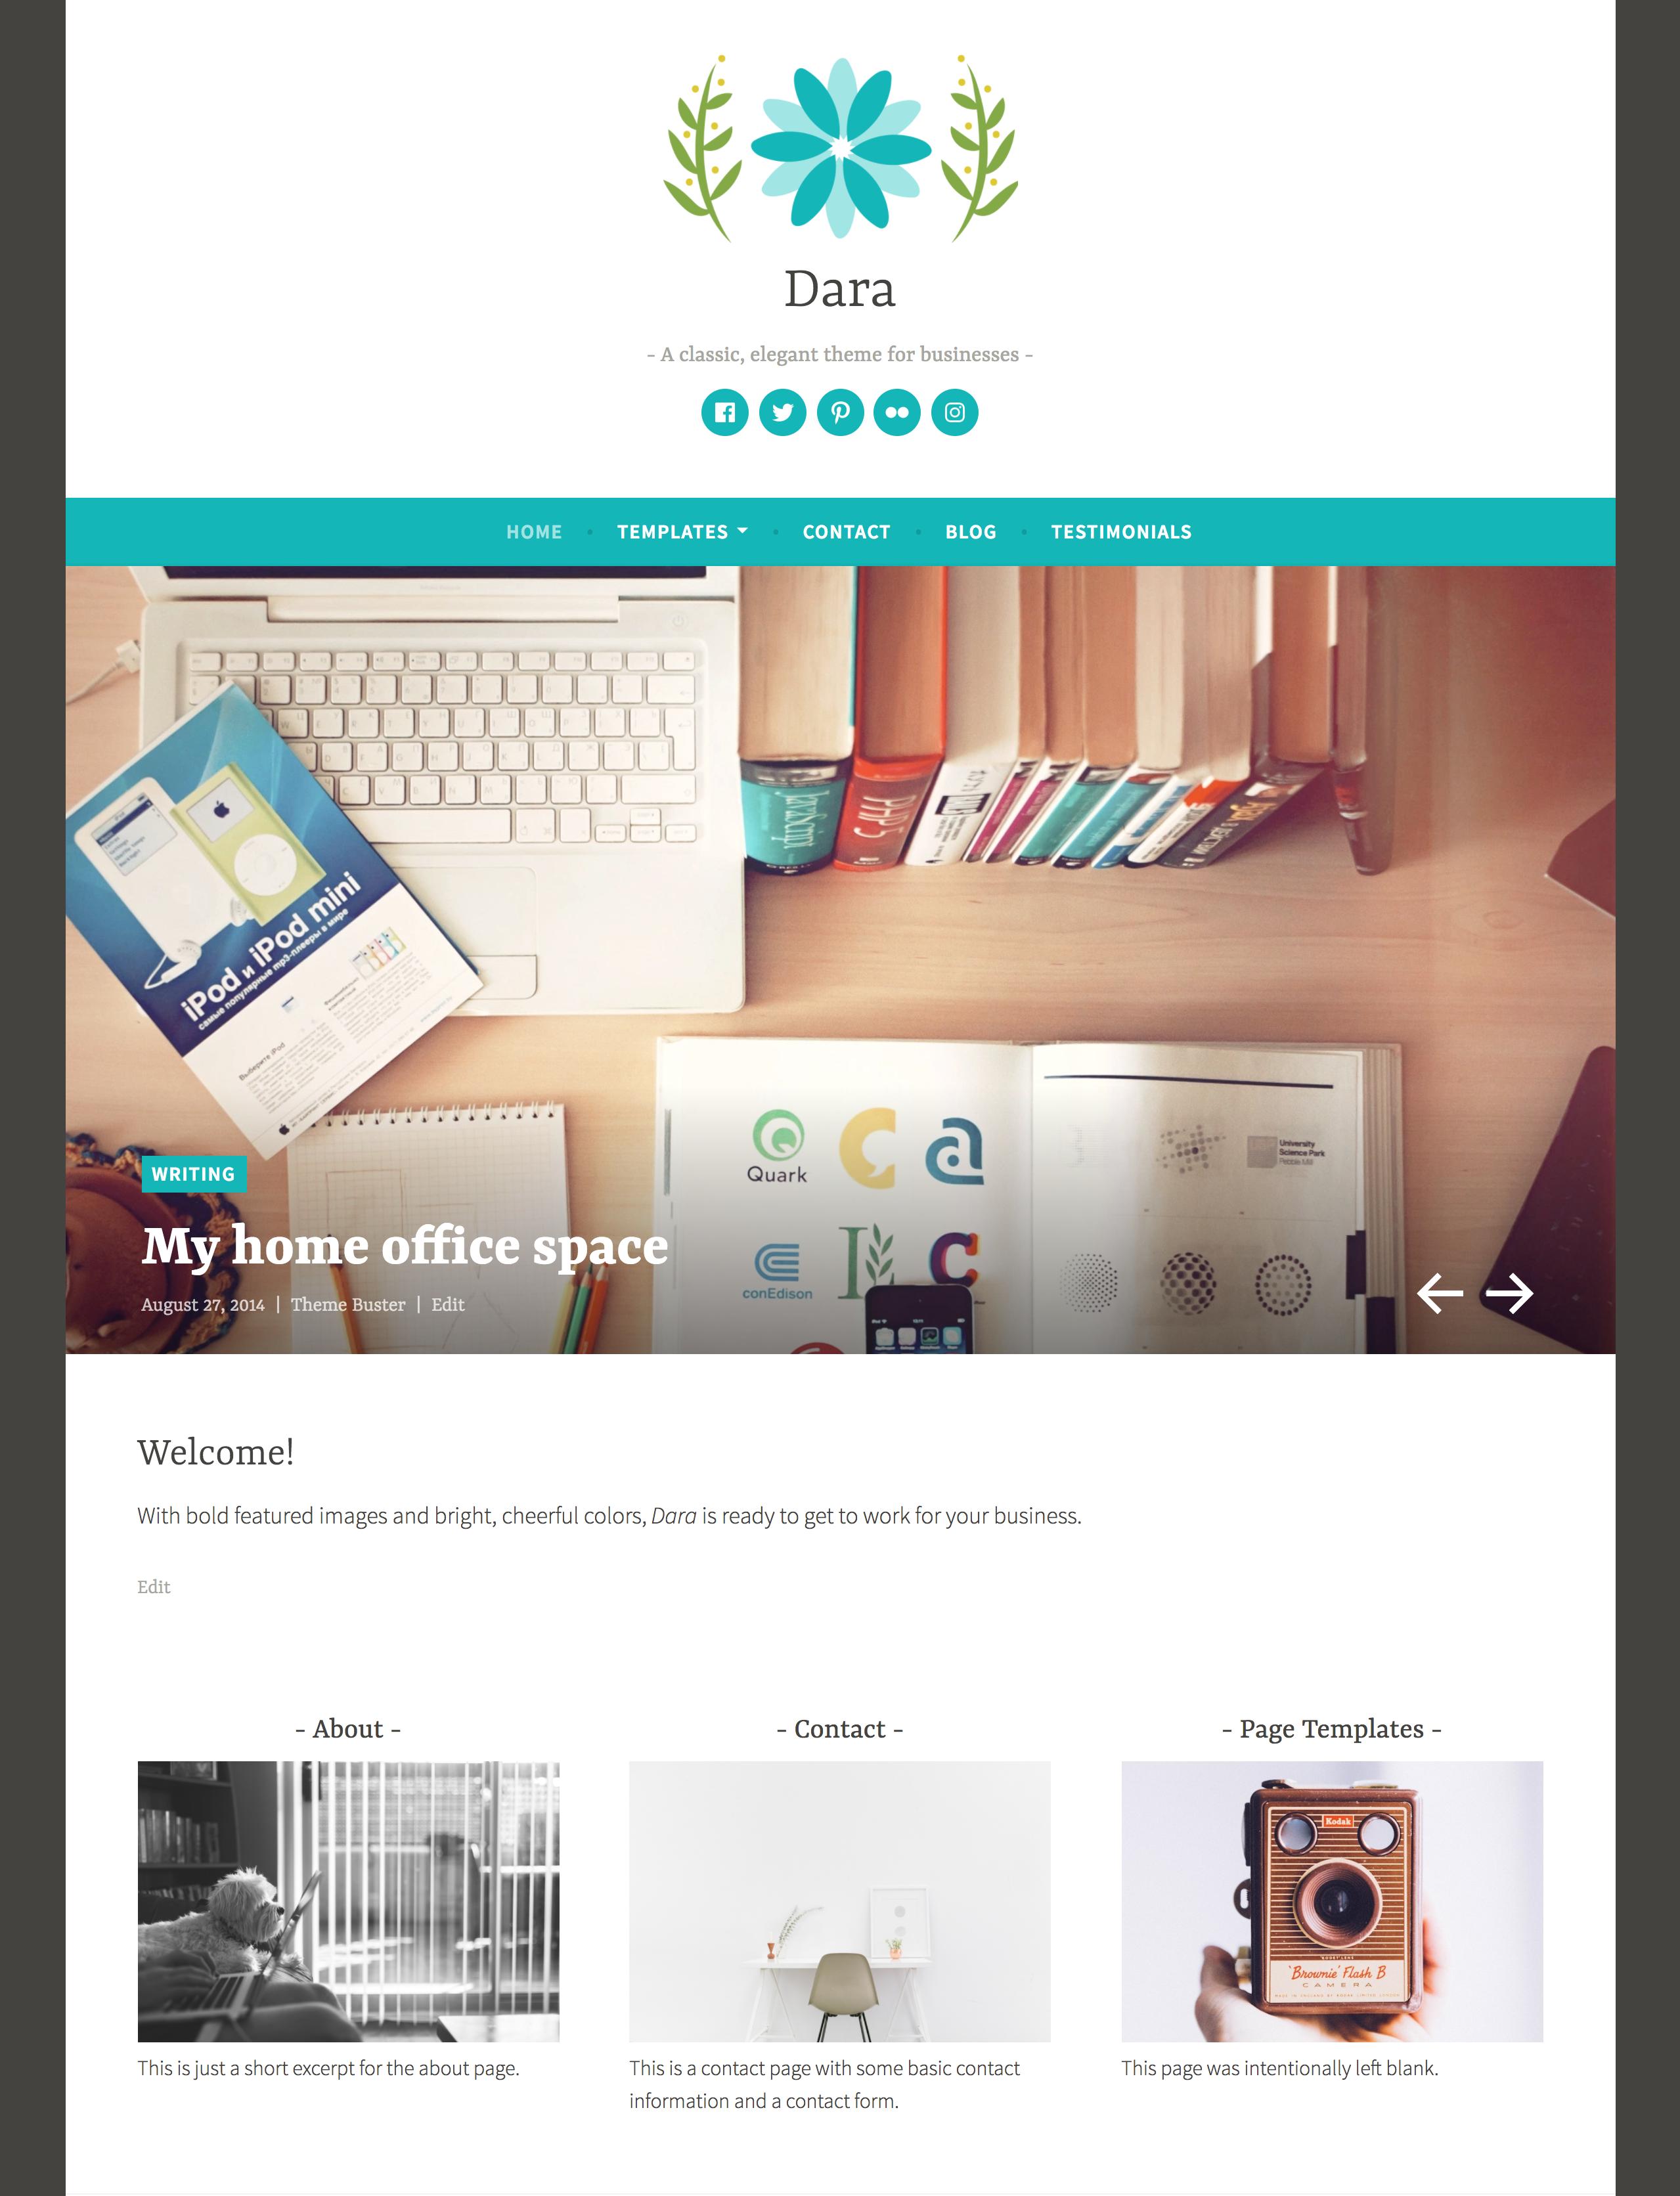 Dara responsive WordPress theme